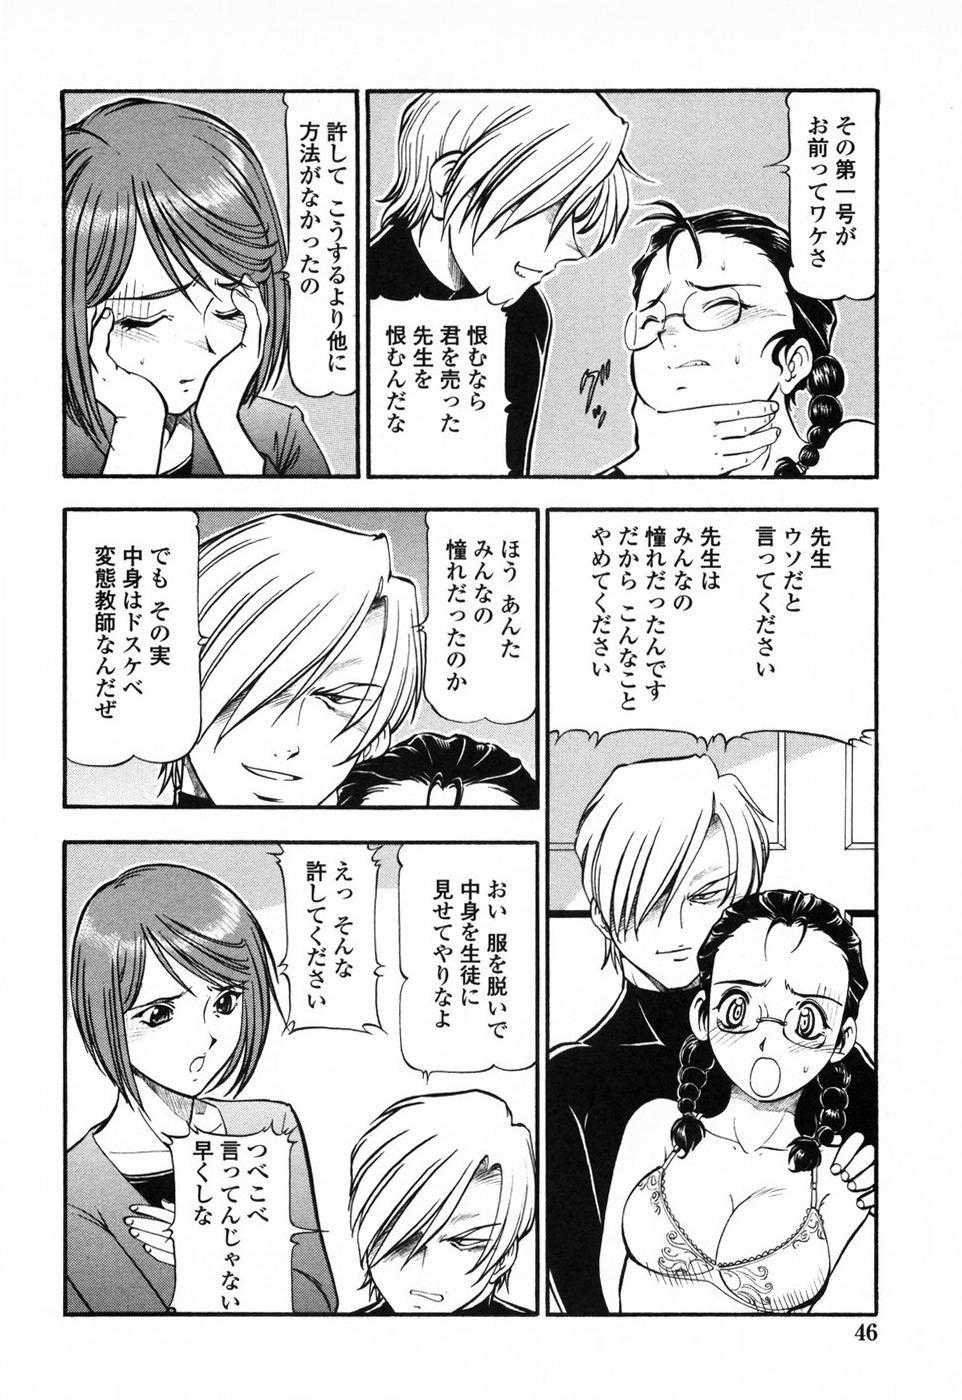 Kichiku Houteishiki - Equation of brutal person 51